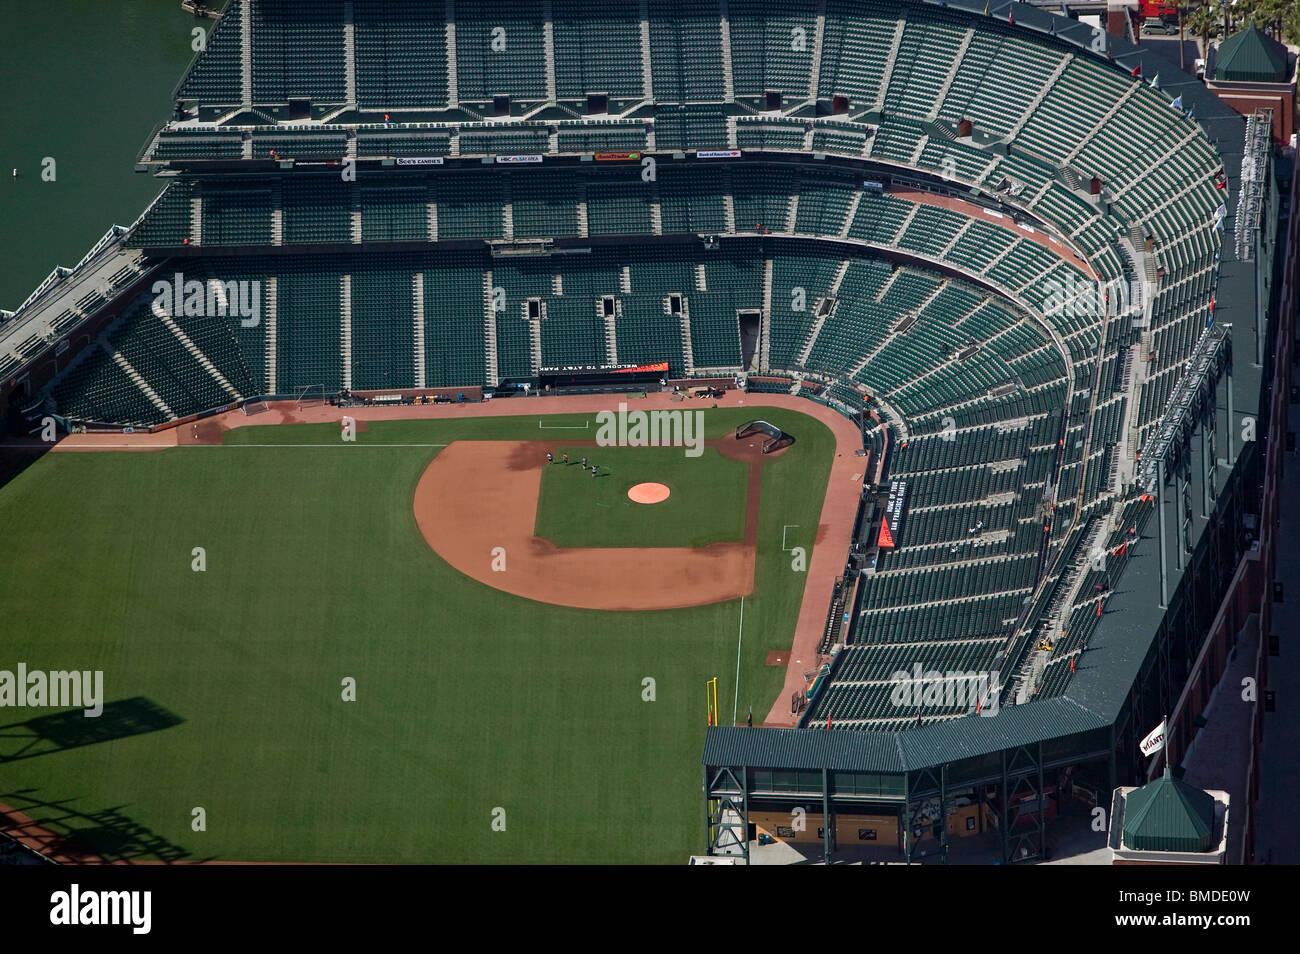 aerial view above baseball diamond empty stadium AT&T Park San Francisco California - Stock Image